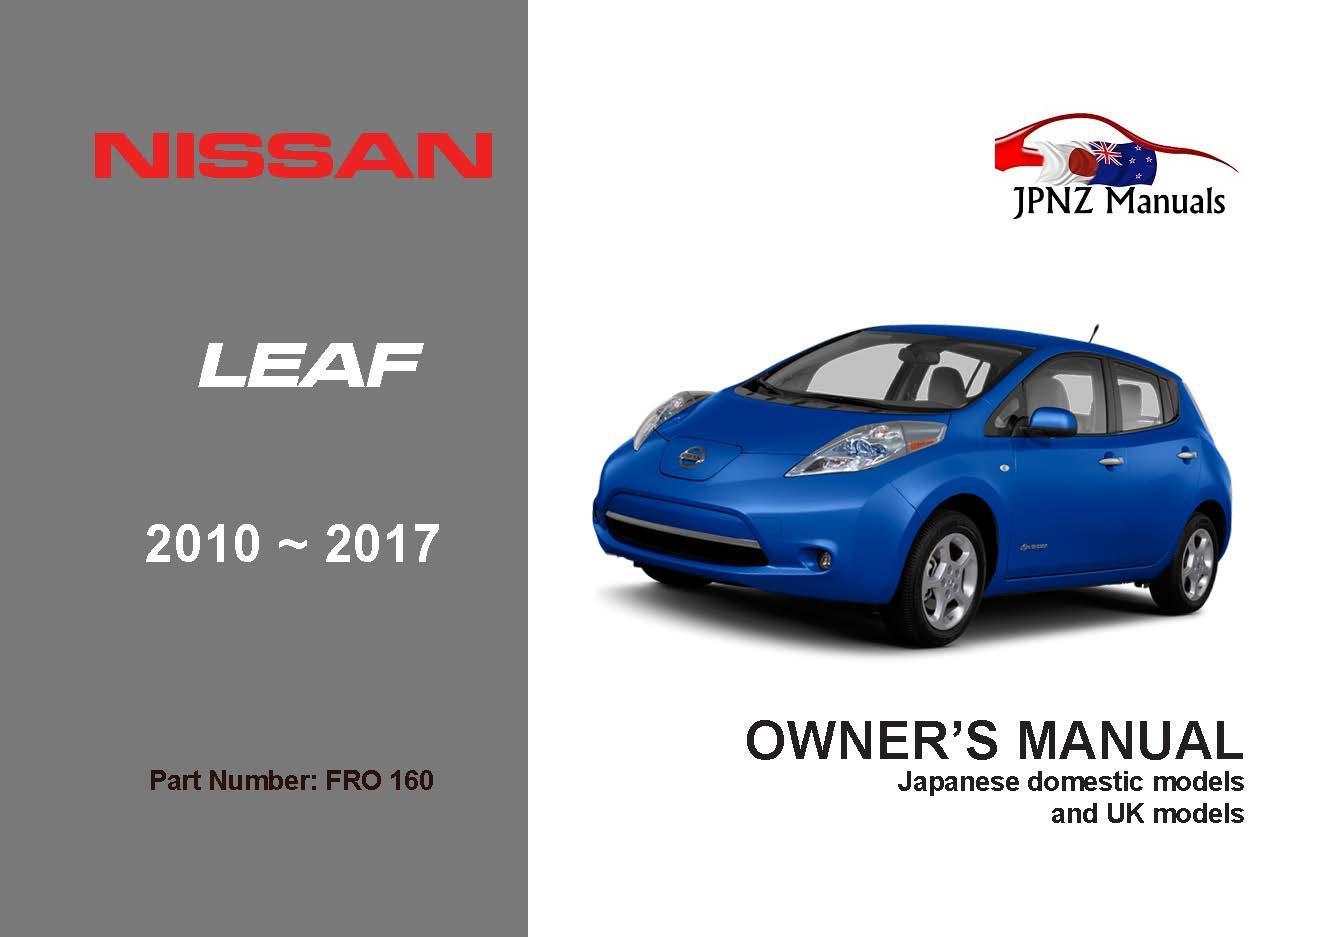 nissan leaf owners manual 2011 2017 jpnz new zealand s rh jpnz co nz Nissan Presage Rear-Camera Nissan Presage Rear-Camera